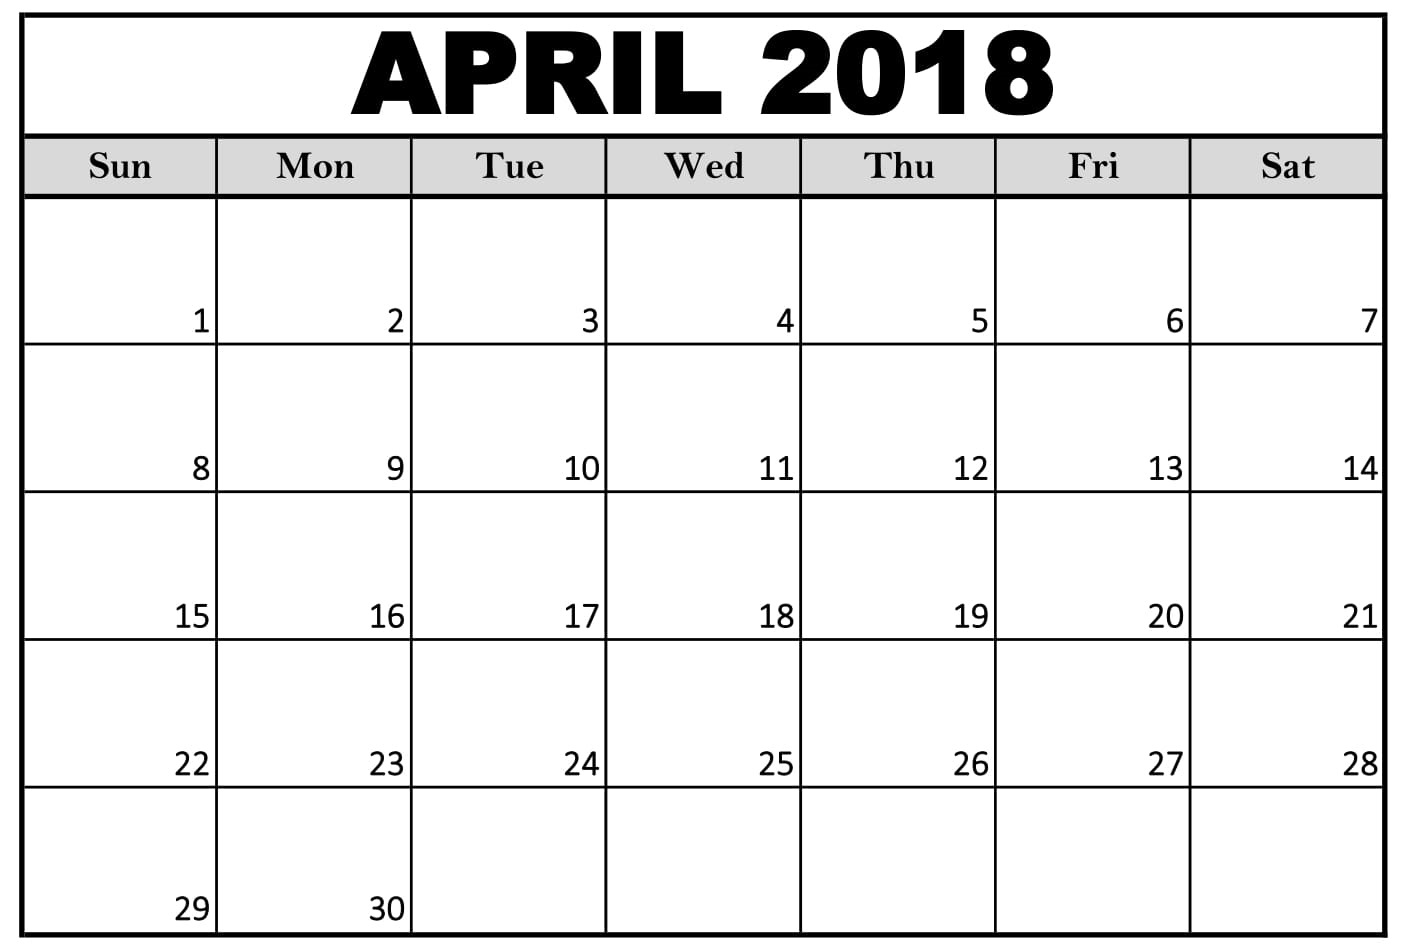 April 2018 Calendar Word, April 2018 Blank Calendar